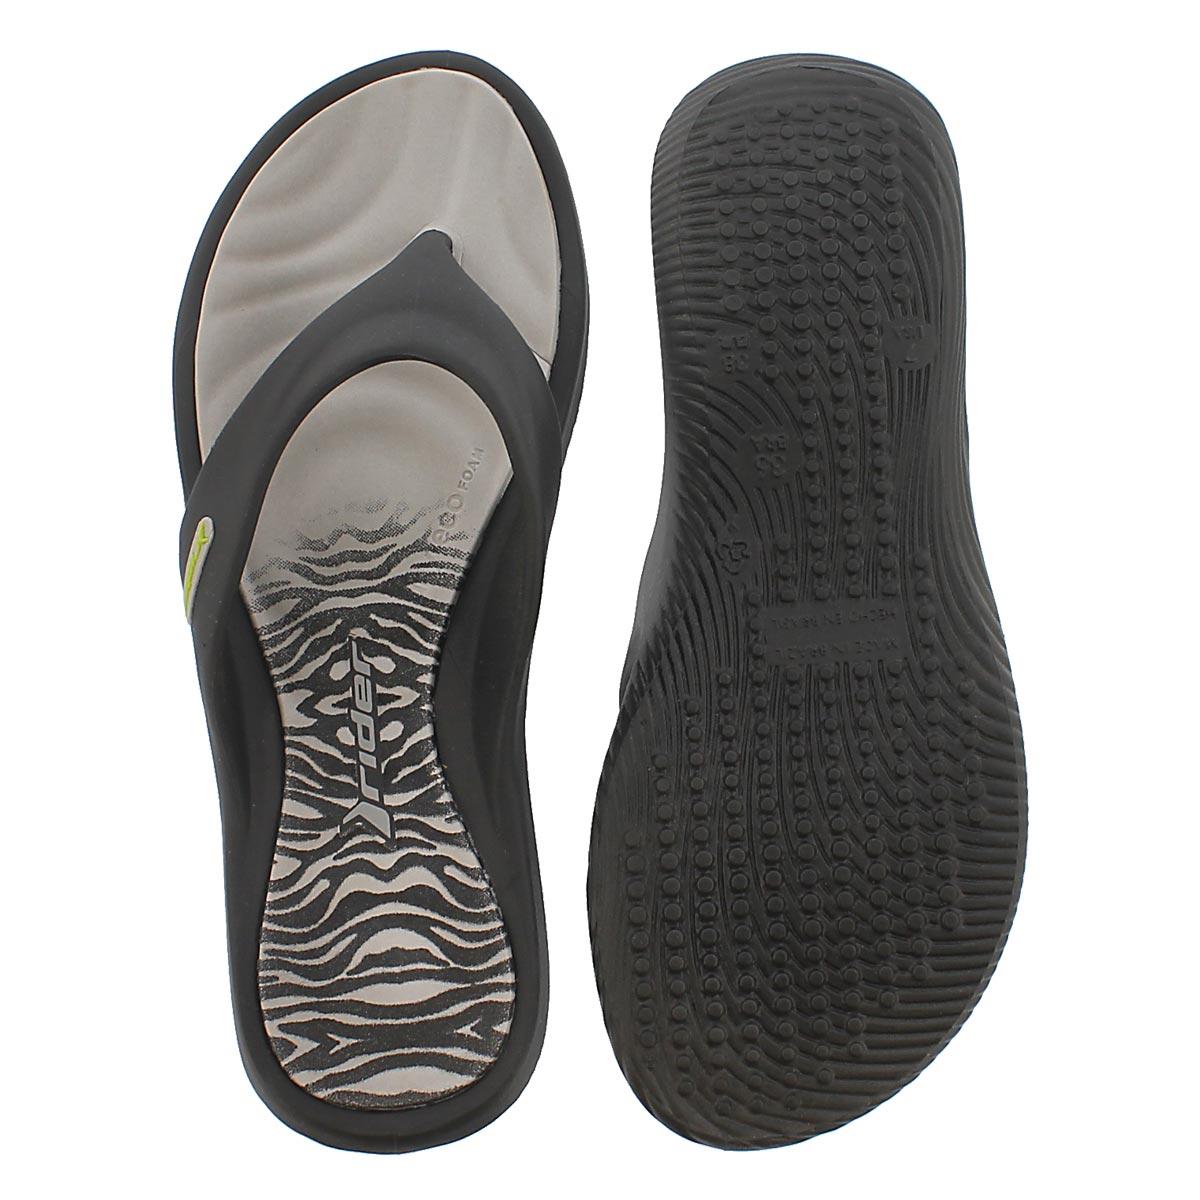 Sandale tong ISLAND VII, gris, femmes